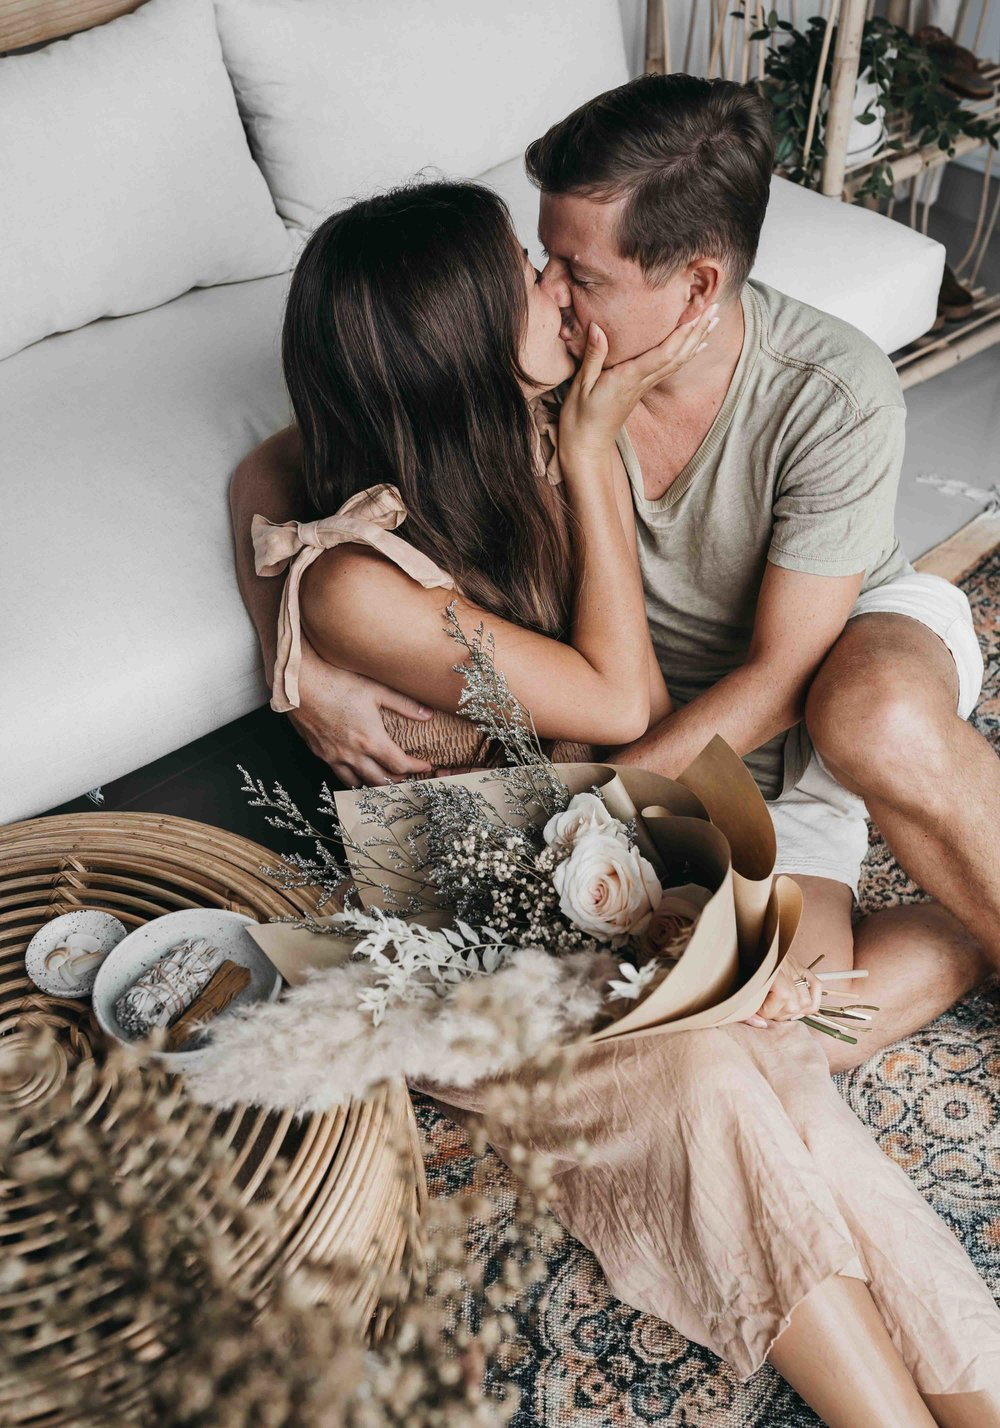 Keira-Mason-Hazel-and-folk-husband-and-wife-kissing.jpg